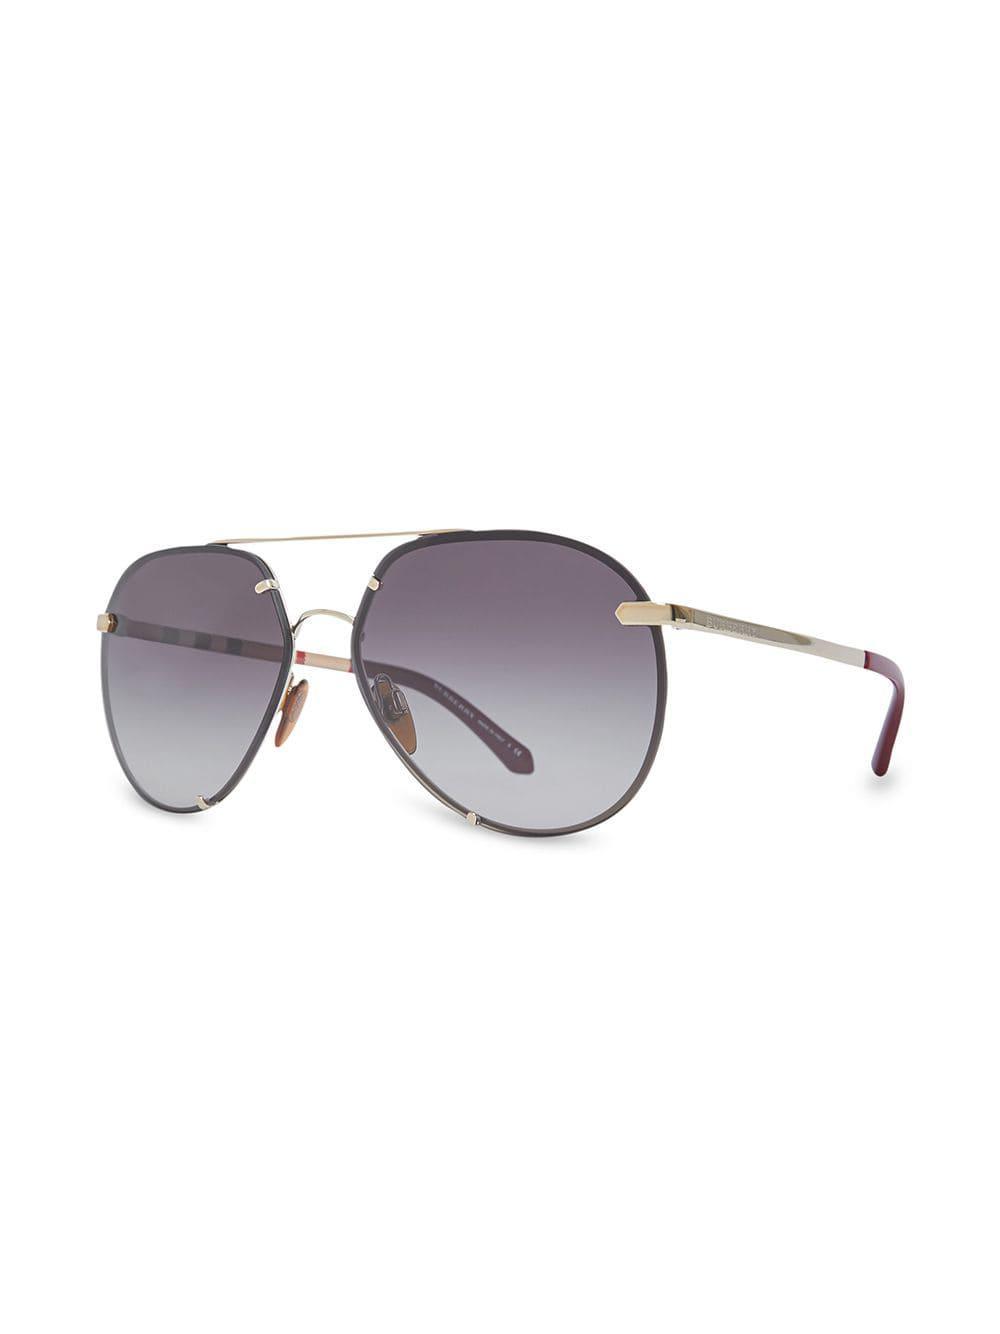 58e337097cd Burberry - Gray Check Detail Pilot Sunglasses - Lyst. View fullscreen